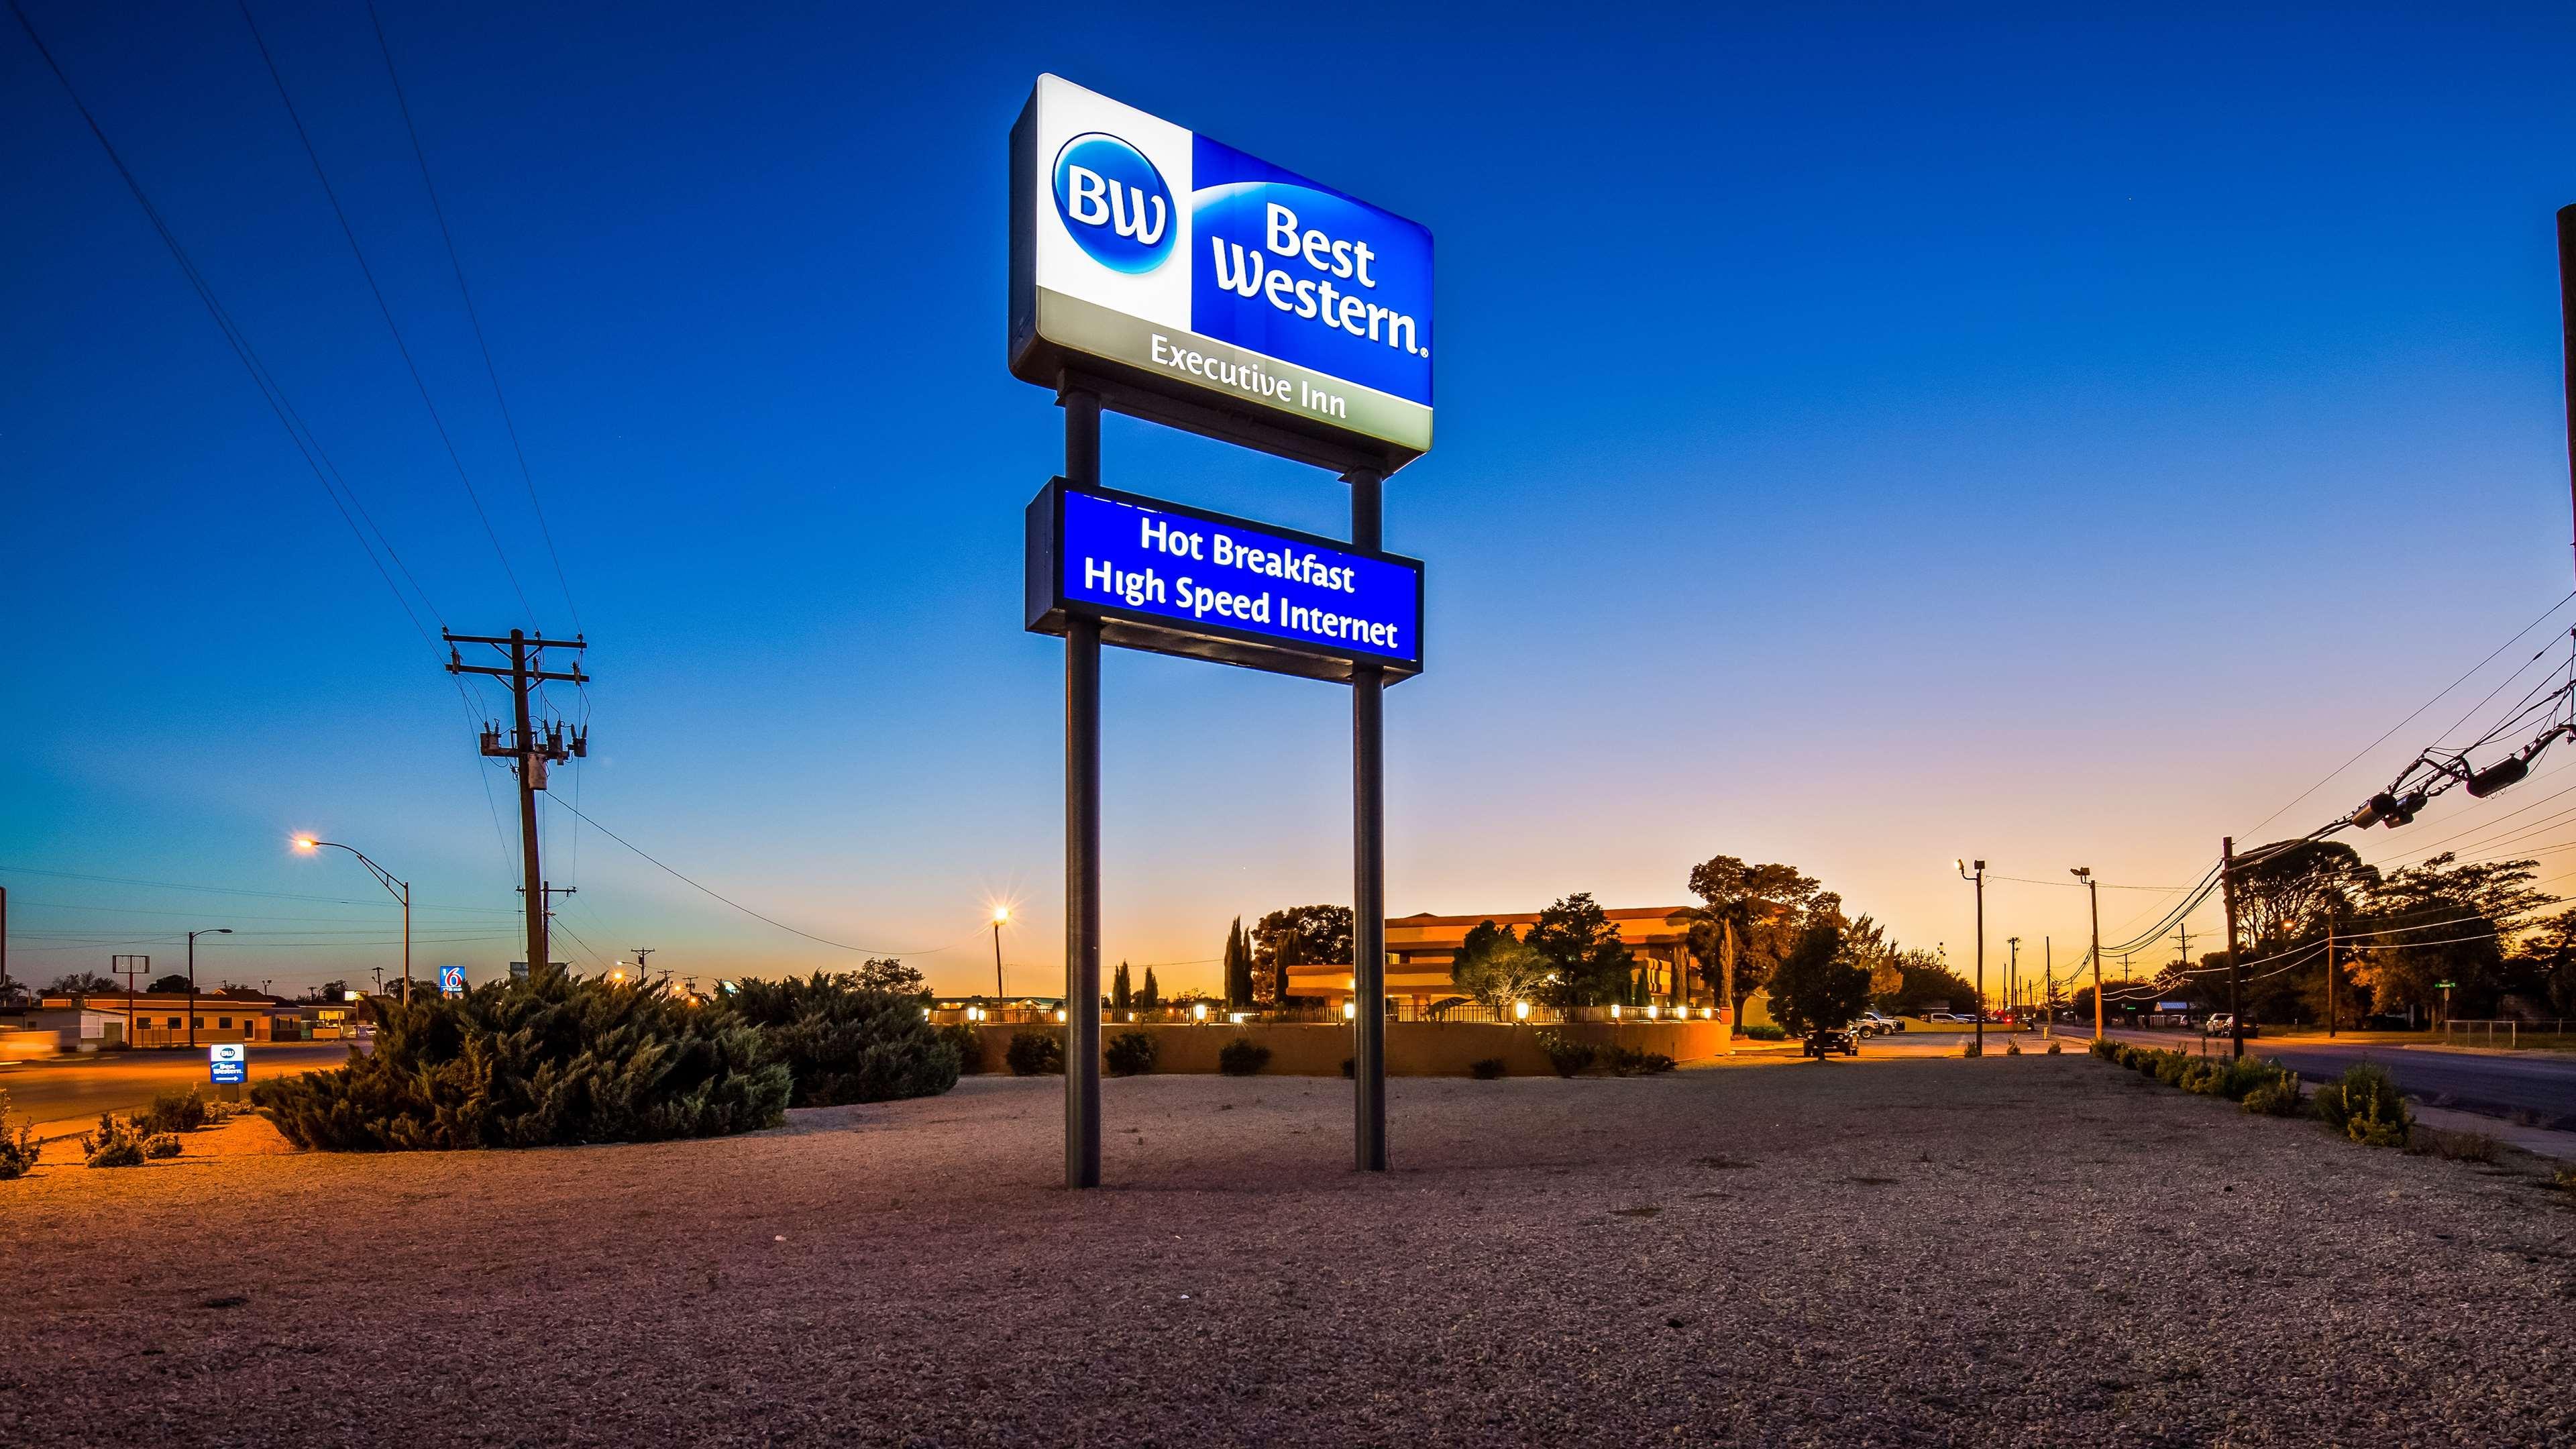 Best Western Executive Inn image 1